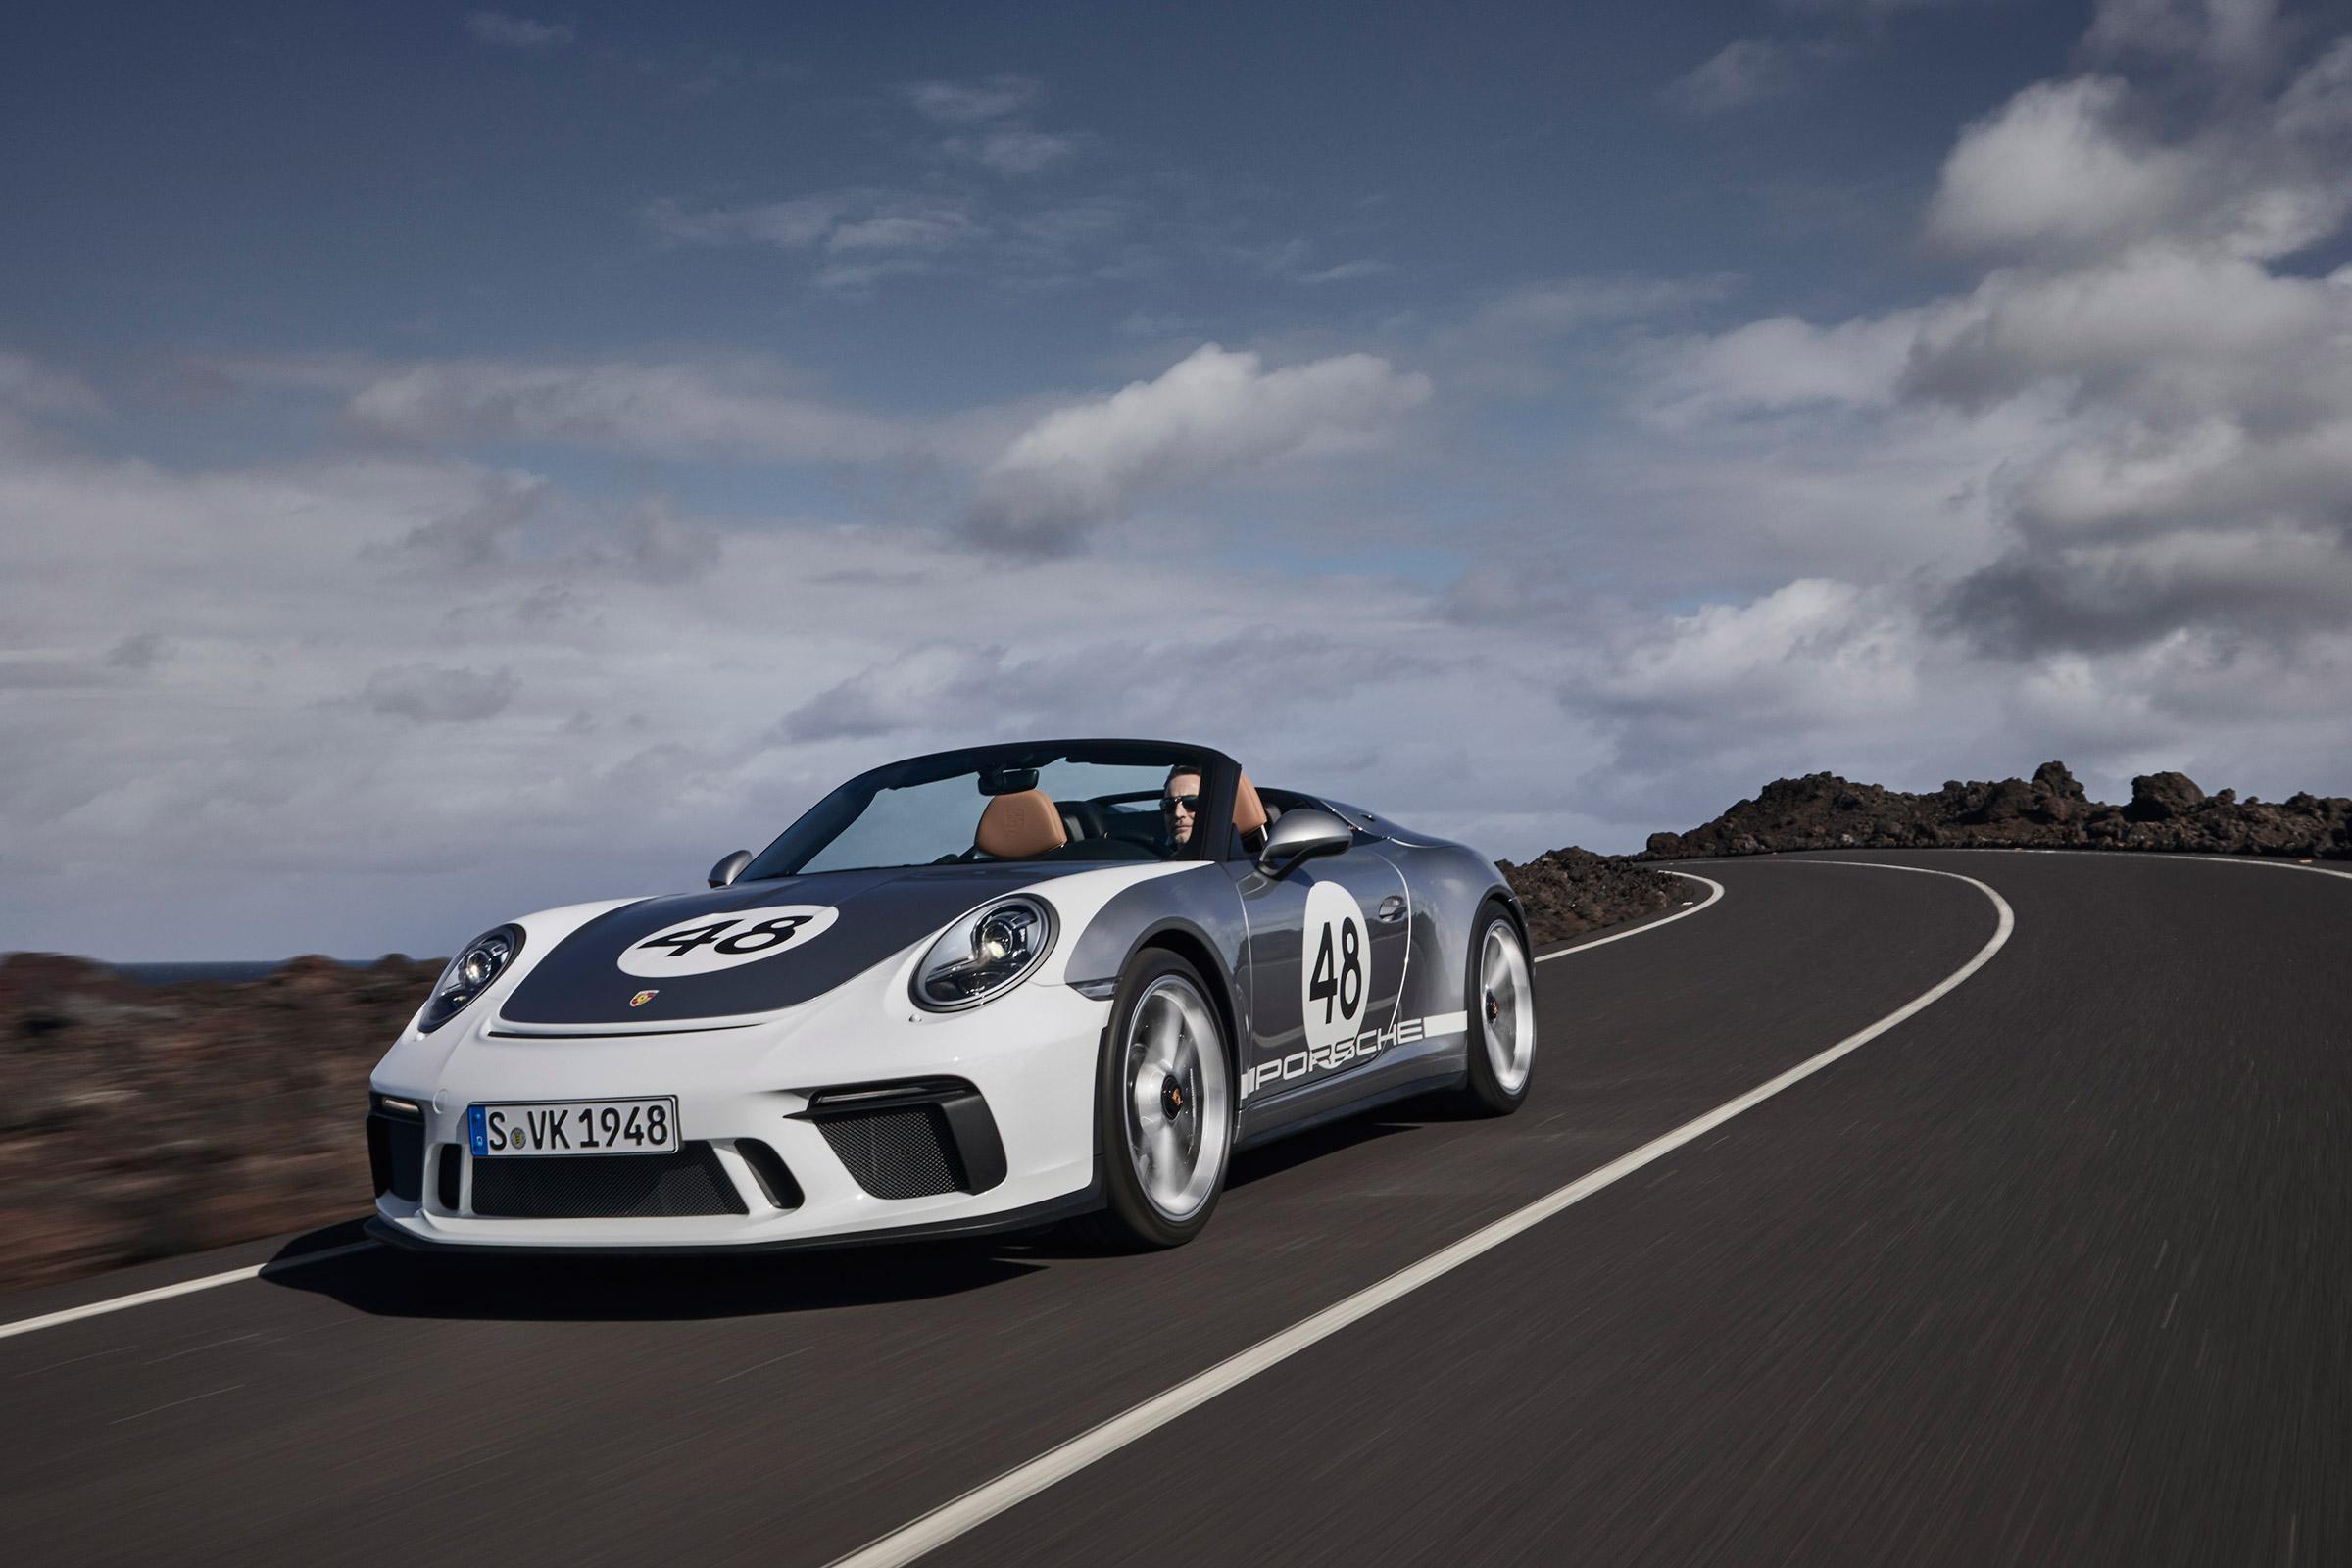 2019 Porsche 911 Speedster Uk Pricing Revealed Evo